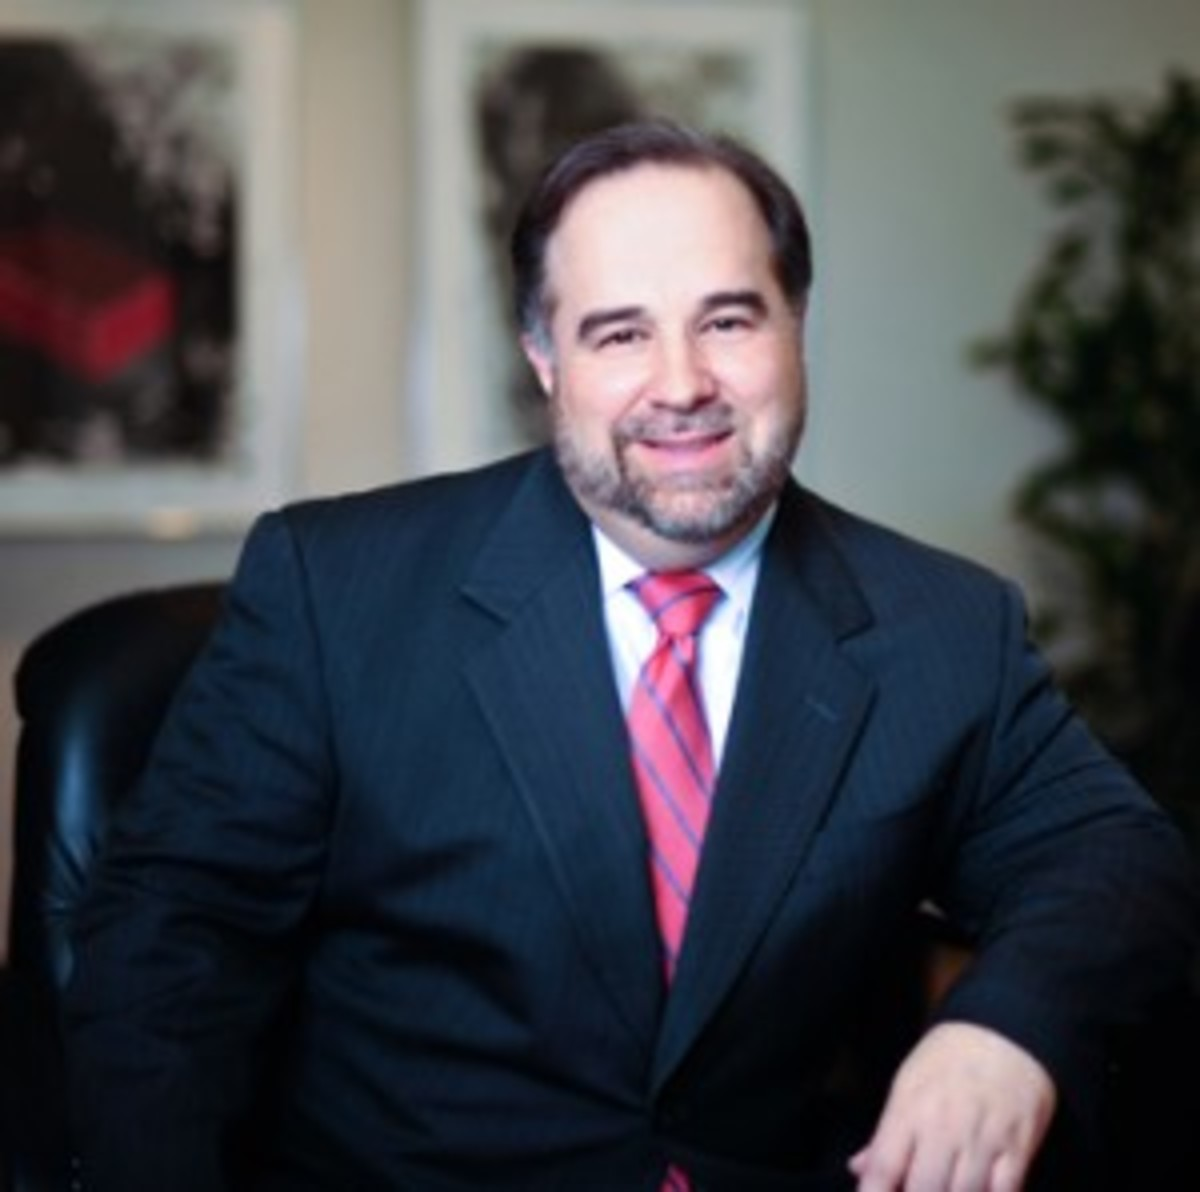 Kevin Yardumian